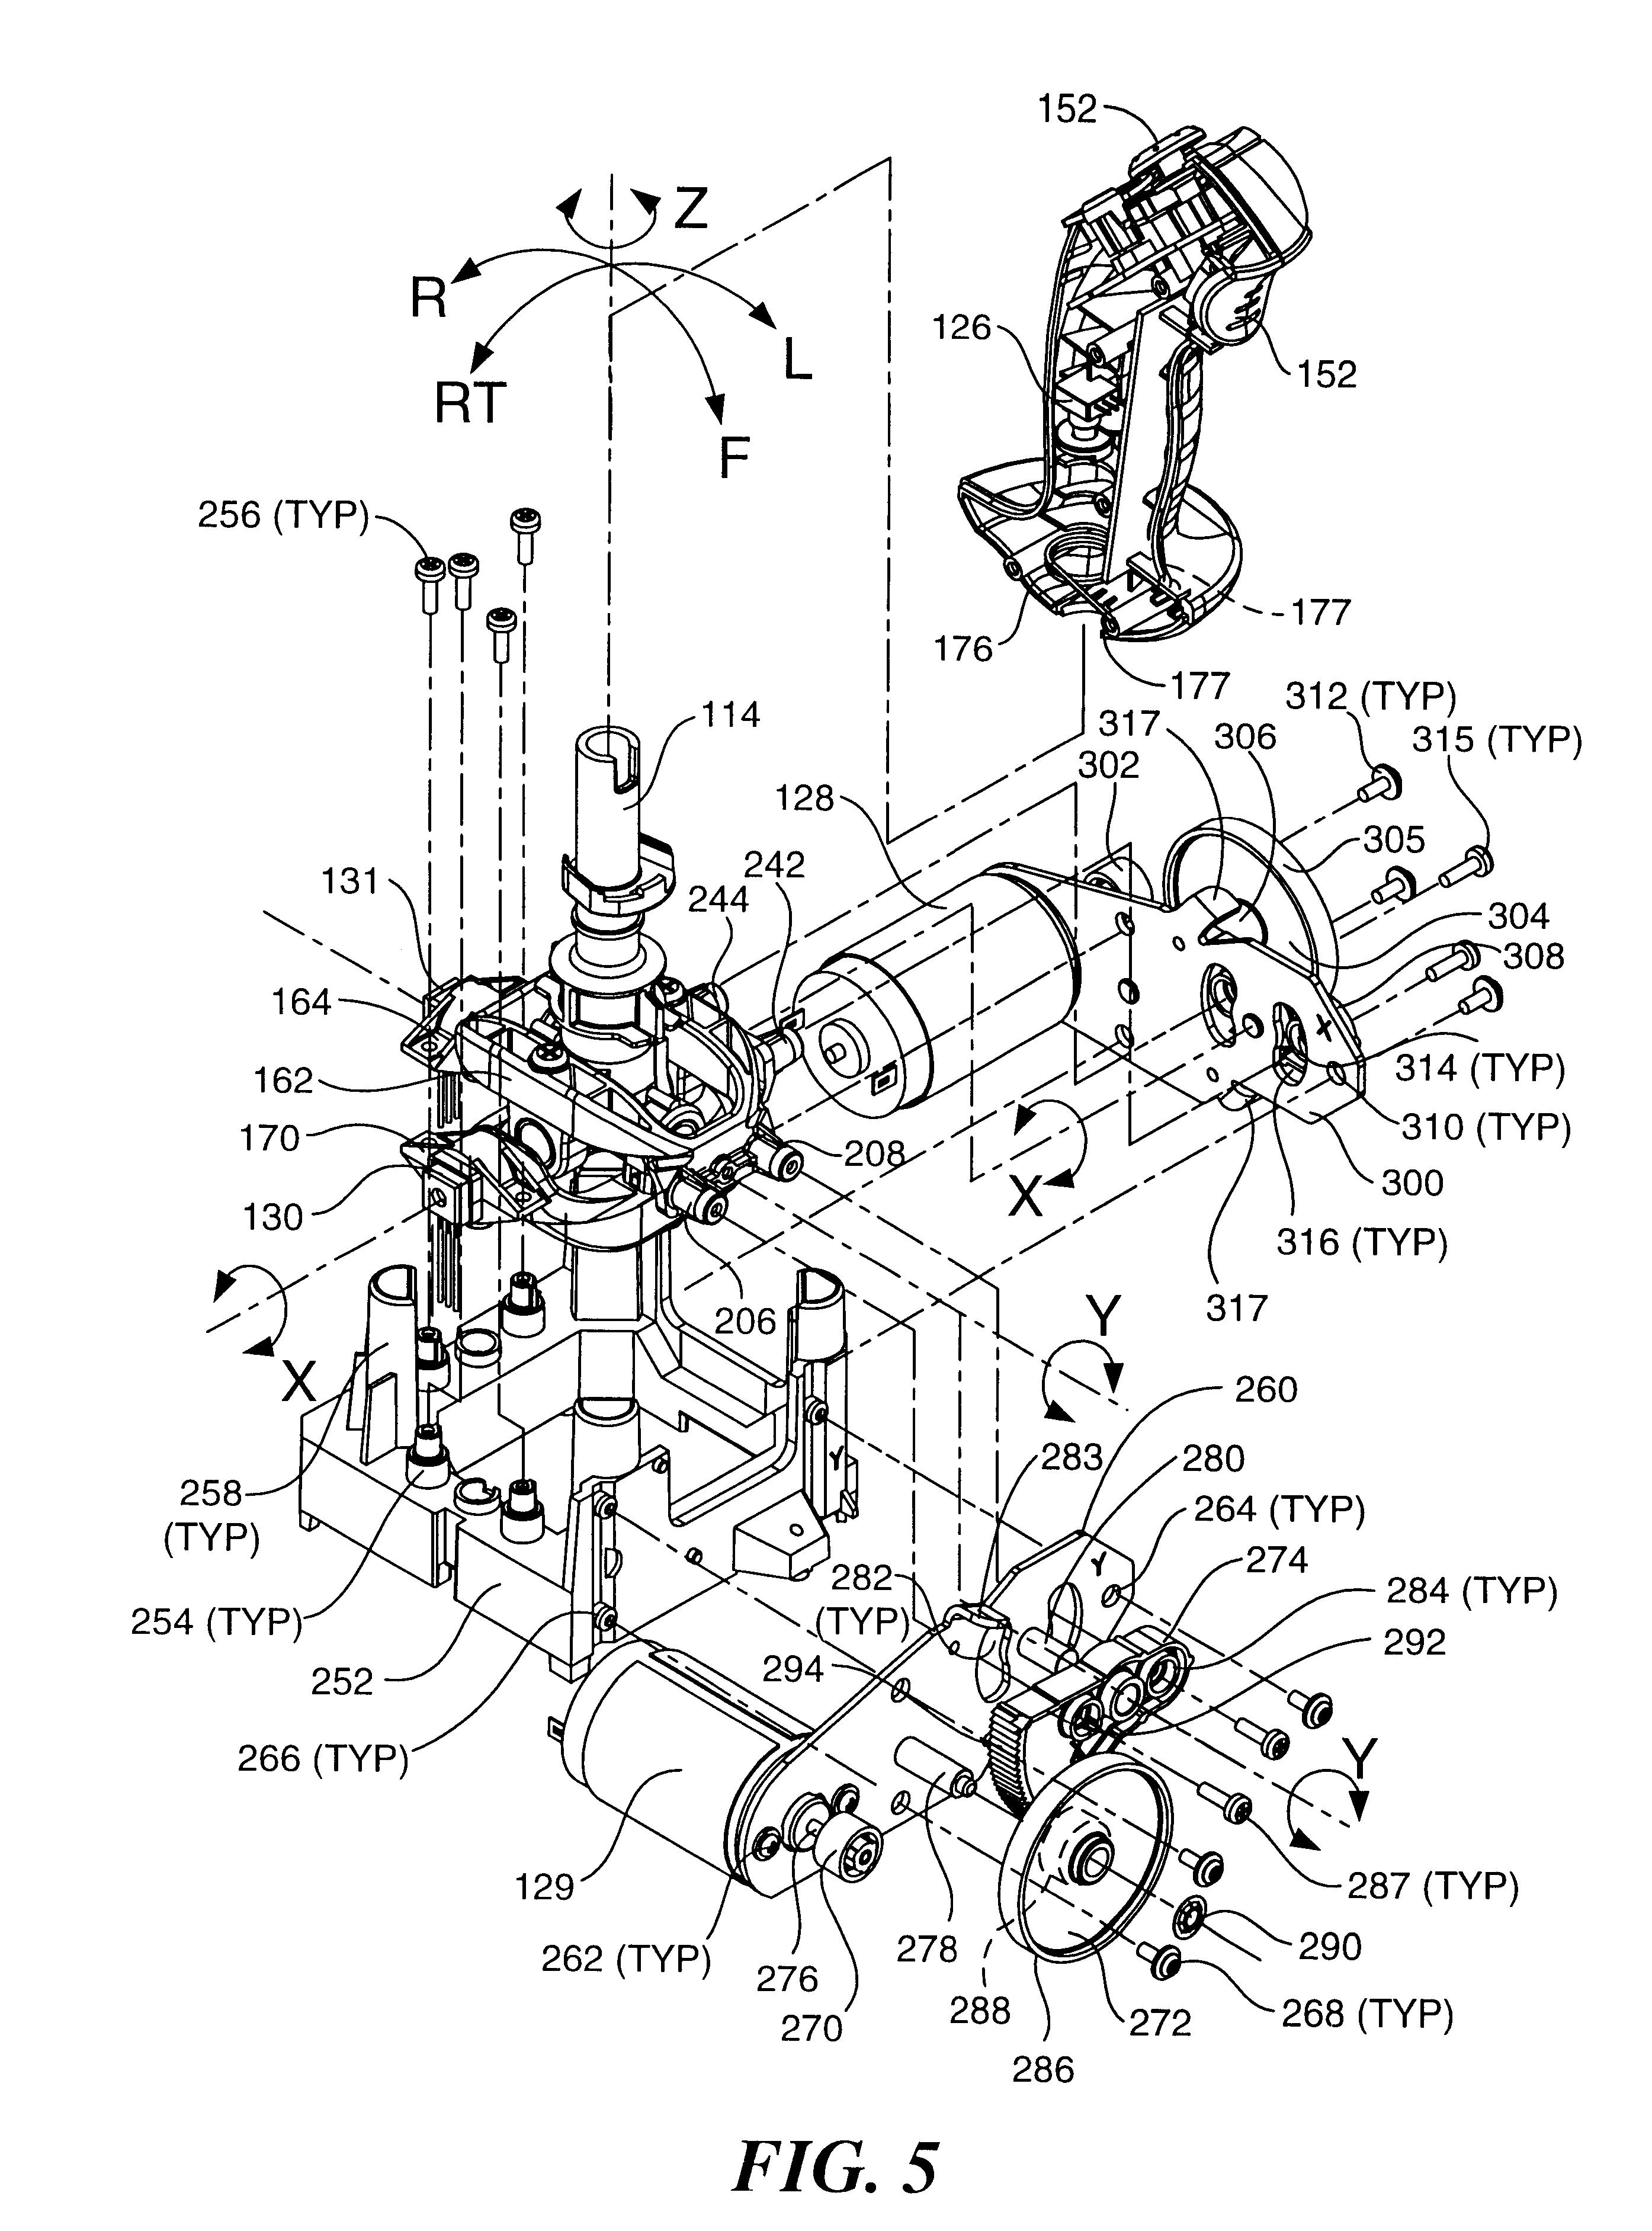 patent us6429849 - haptic feedback joystick